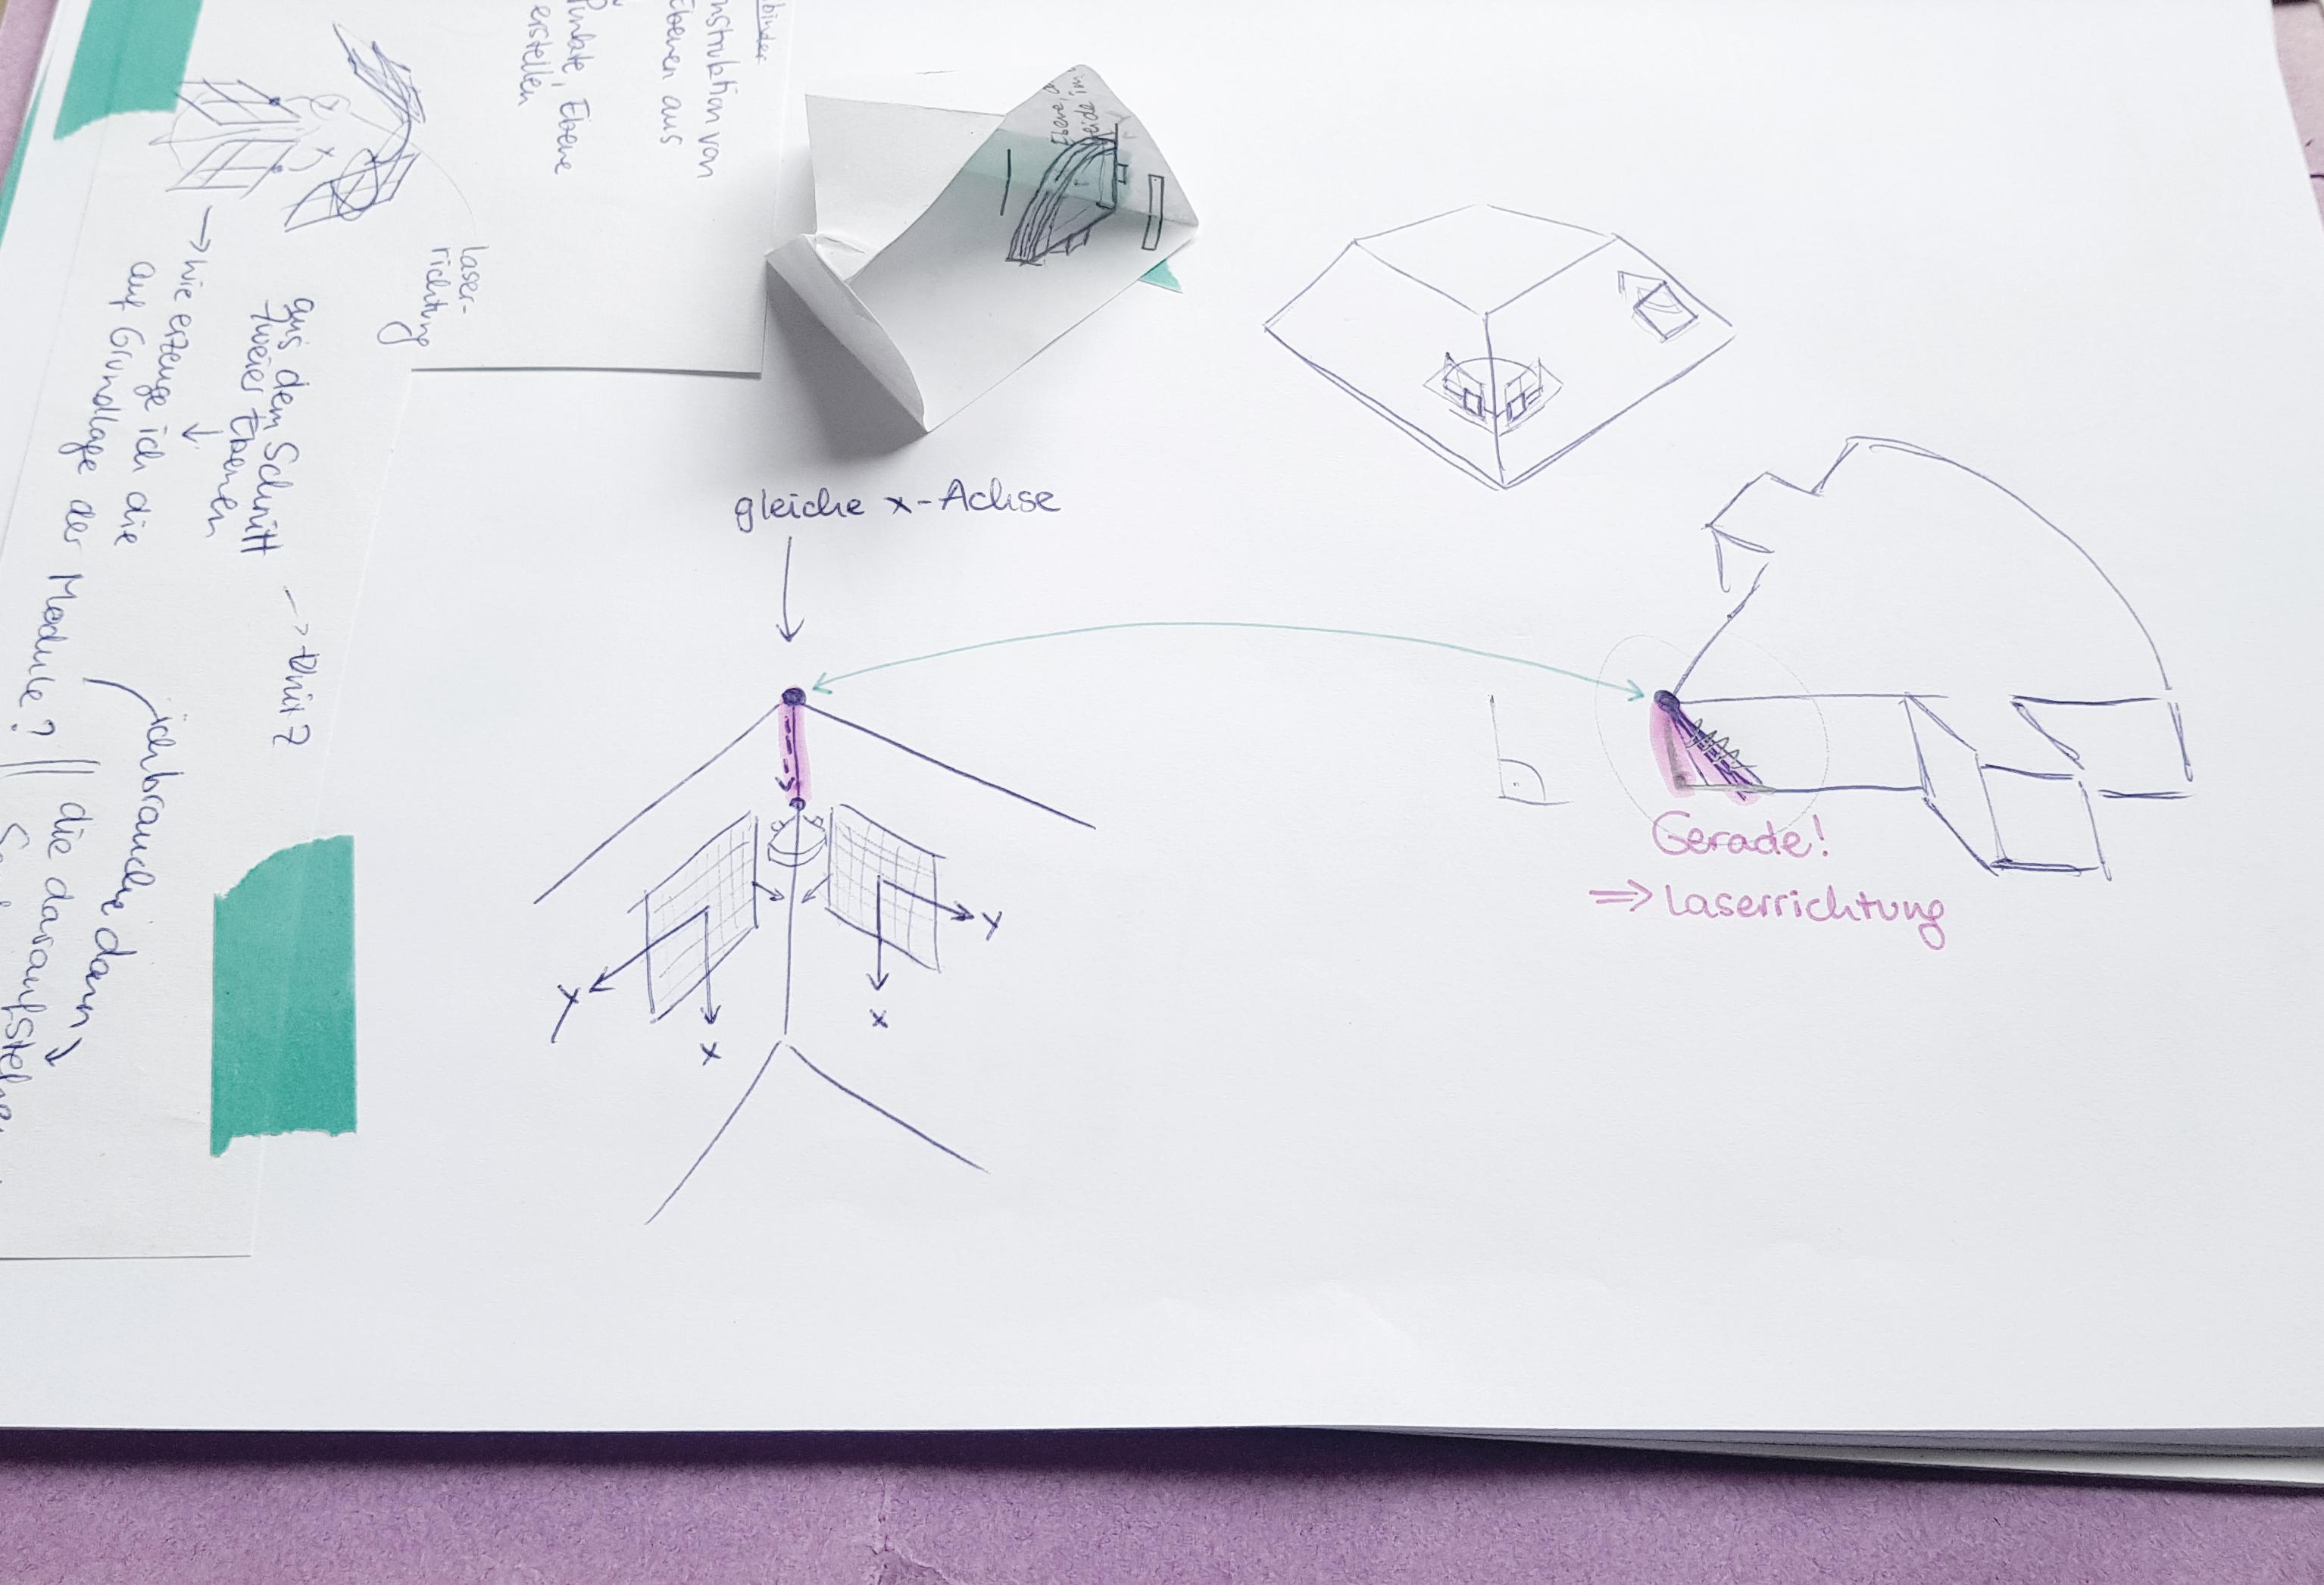 Analoge Skizzen zu Projektdetails